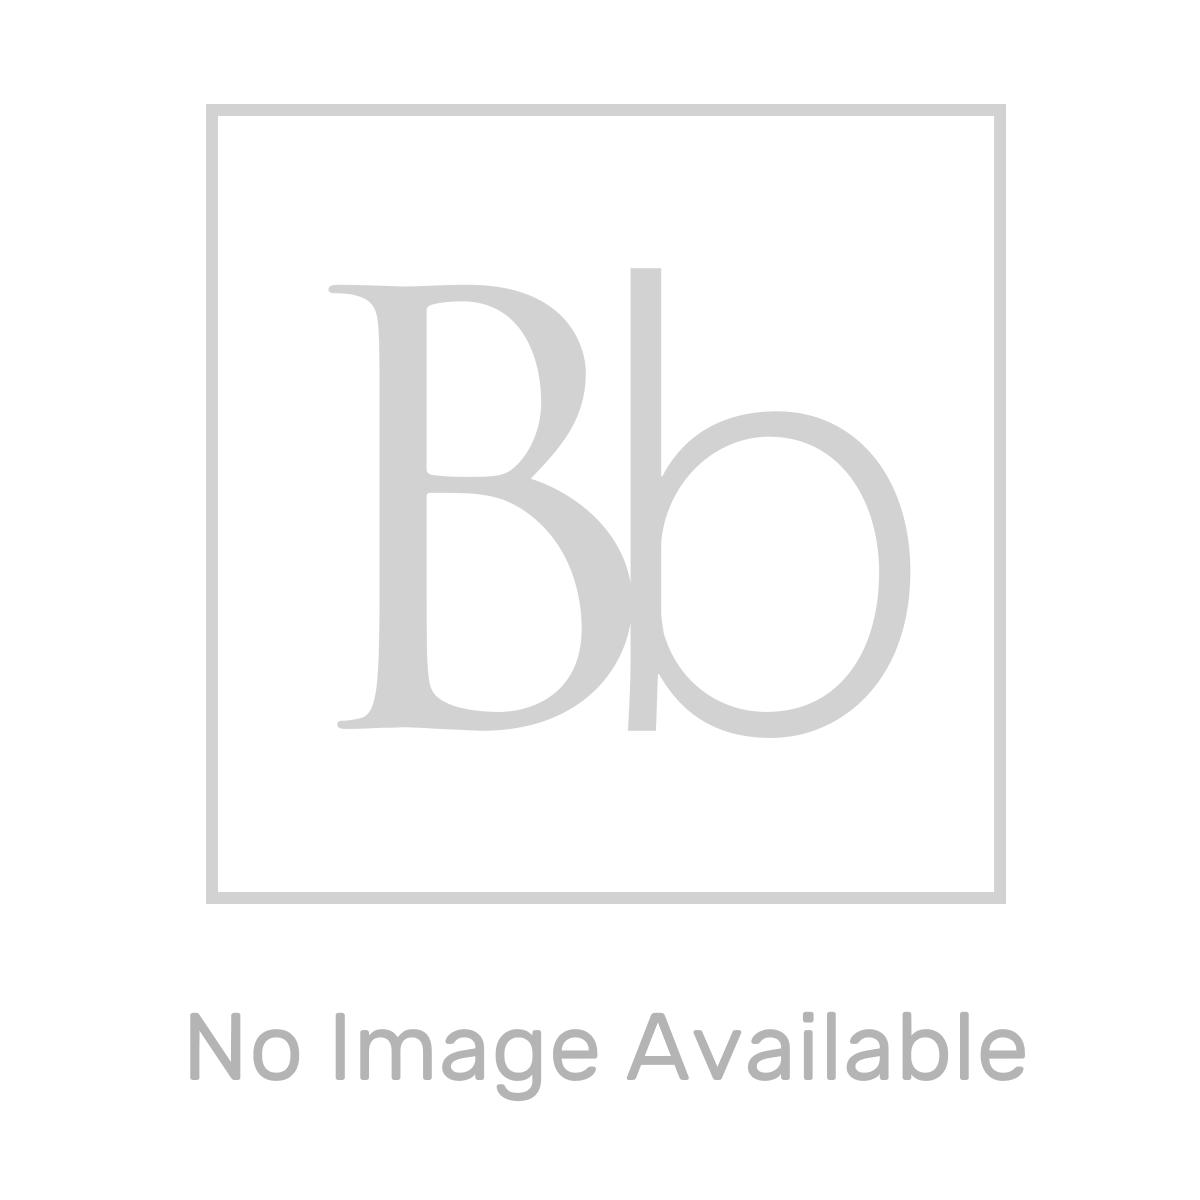 Nuie Athena Natural Oak 2 Door Wall Hung Vanity Unit with 18mm Worktop 800mm